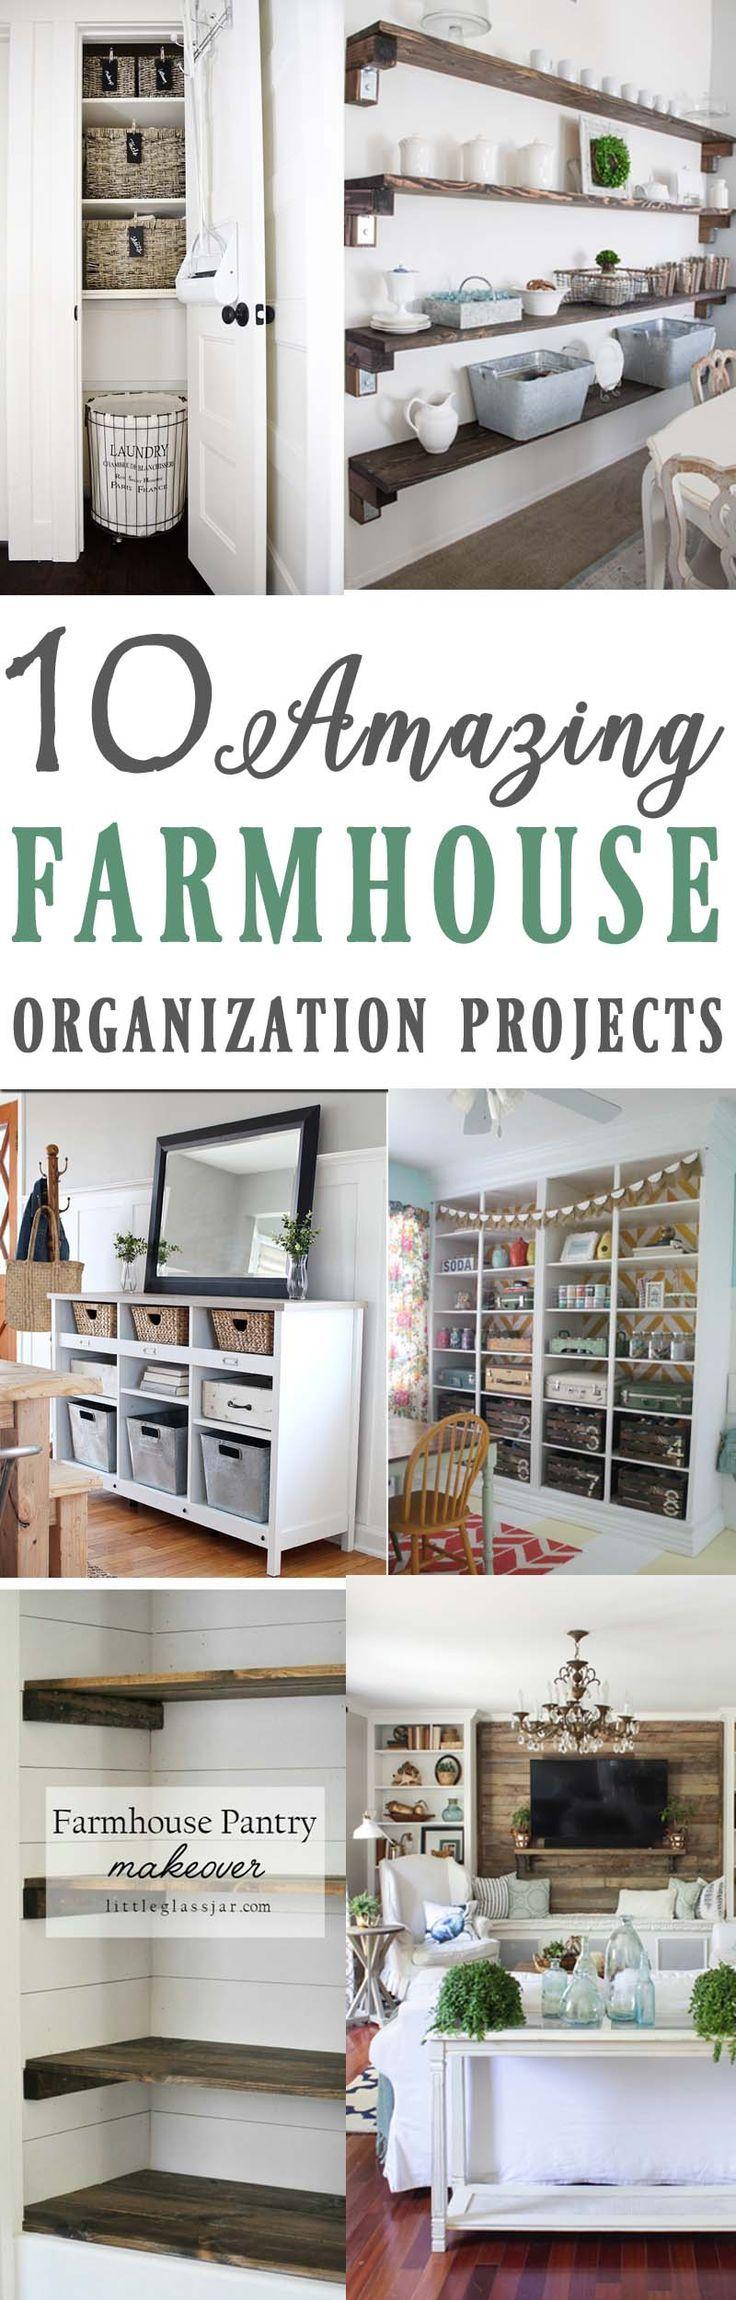 10 Amazing Farmhouse Inspired storage and organization ideas!